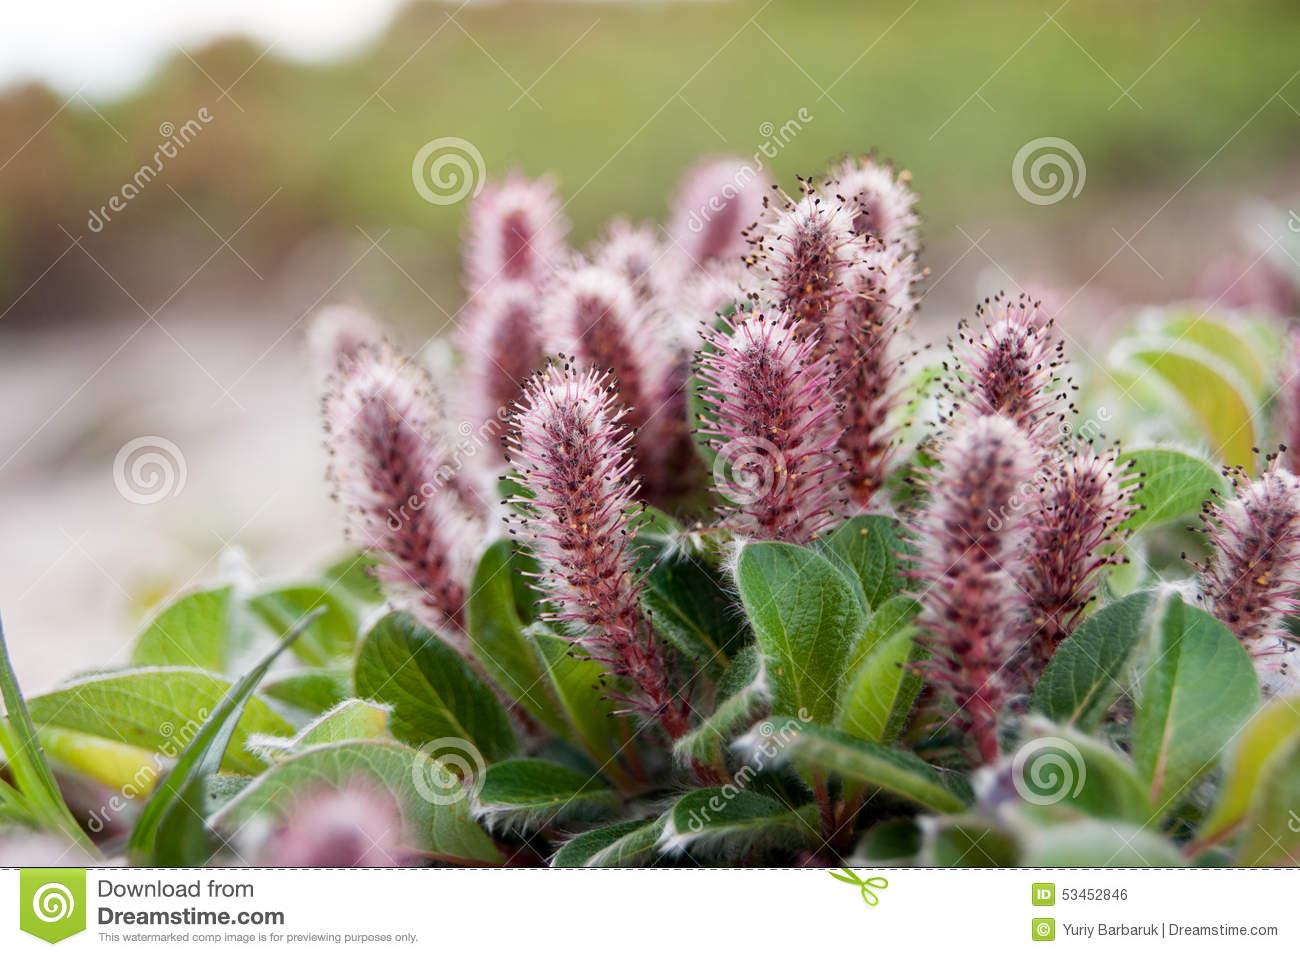 Salix Arctica (Arctic Willow) Stock Photo.